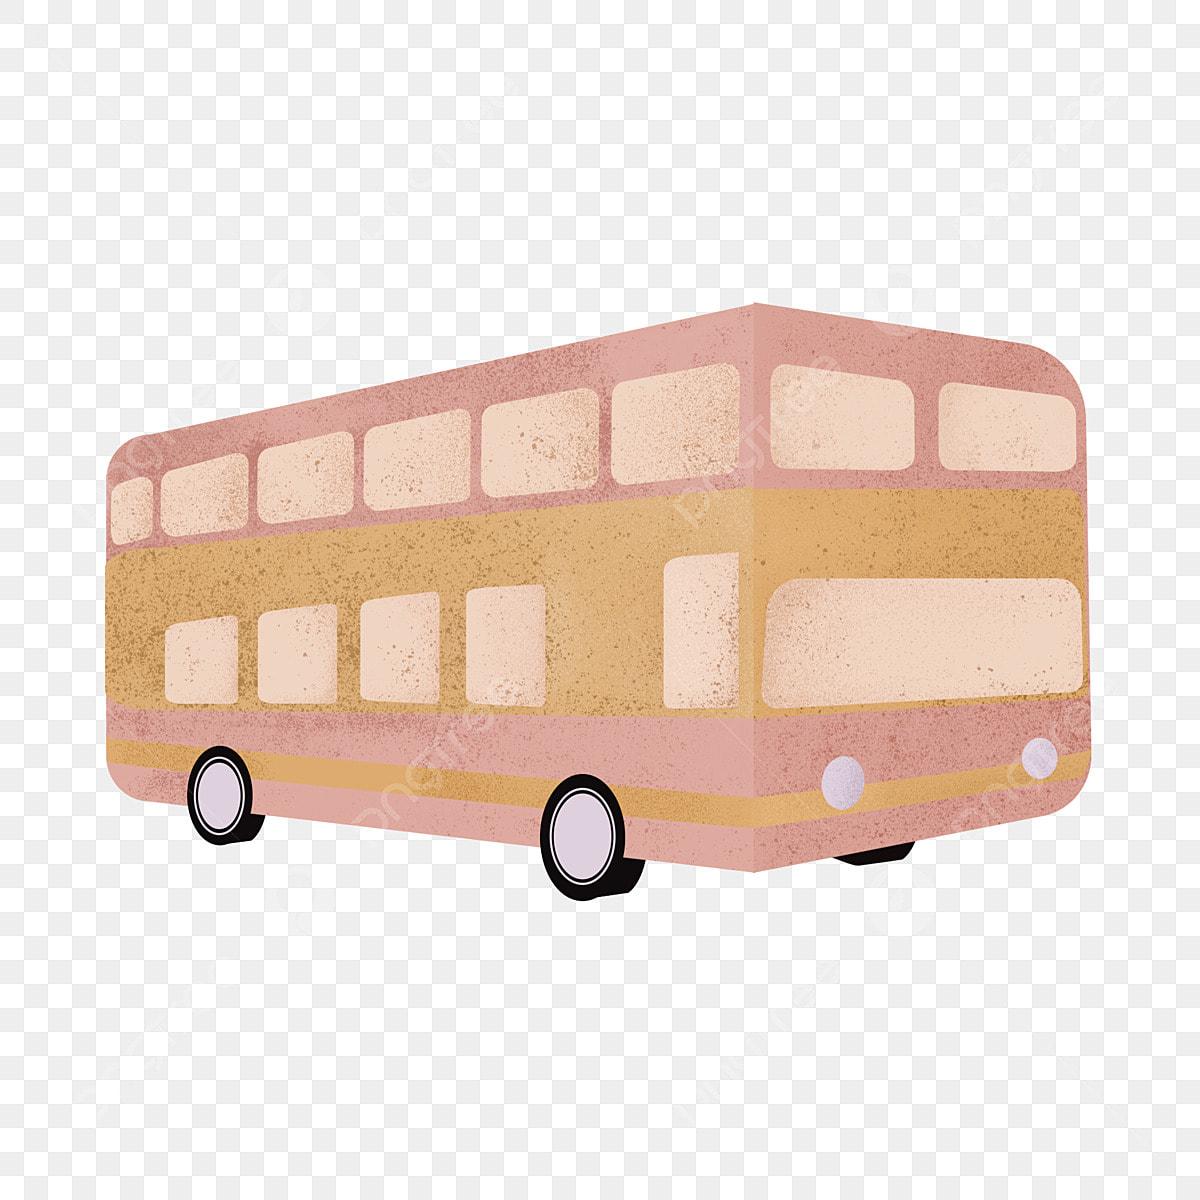 éléments Dillustration Bus Dessin Animé Dessin Animé